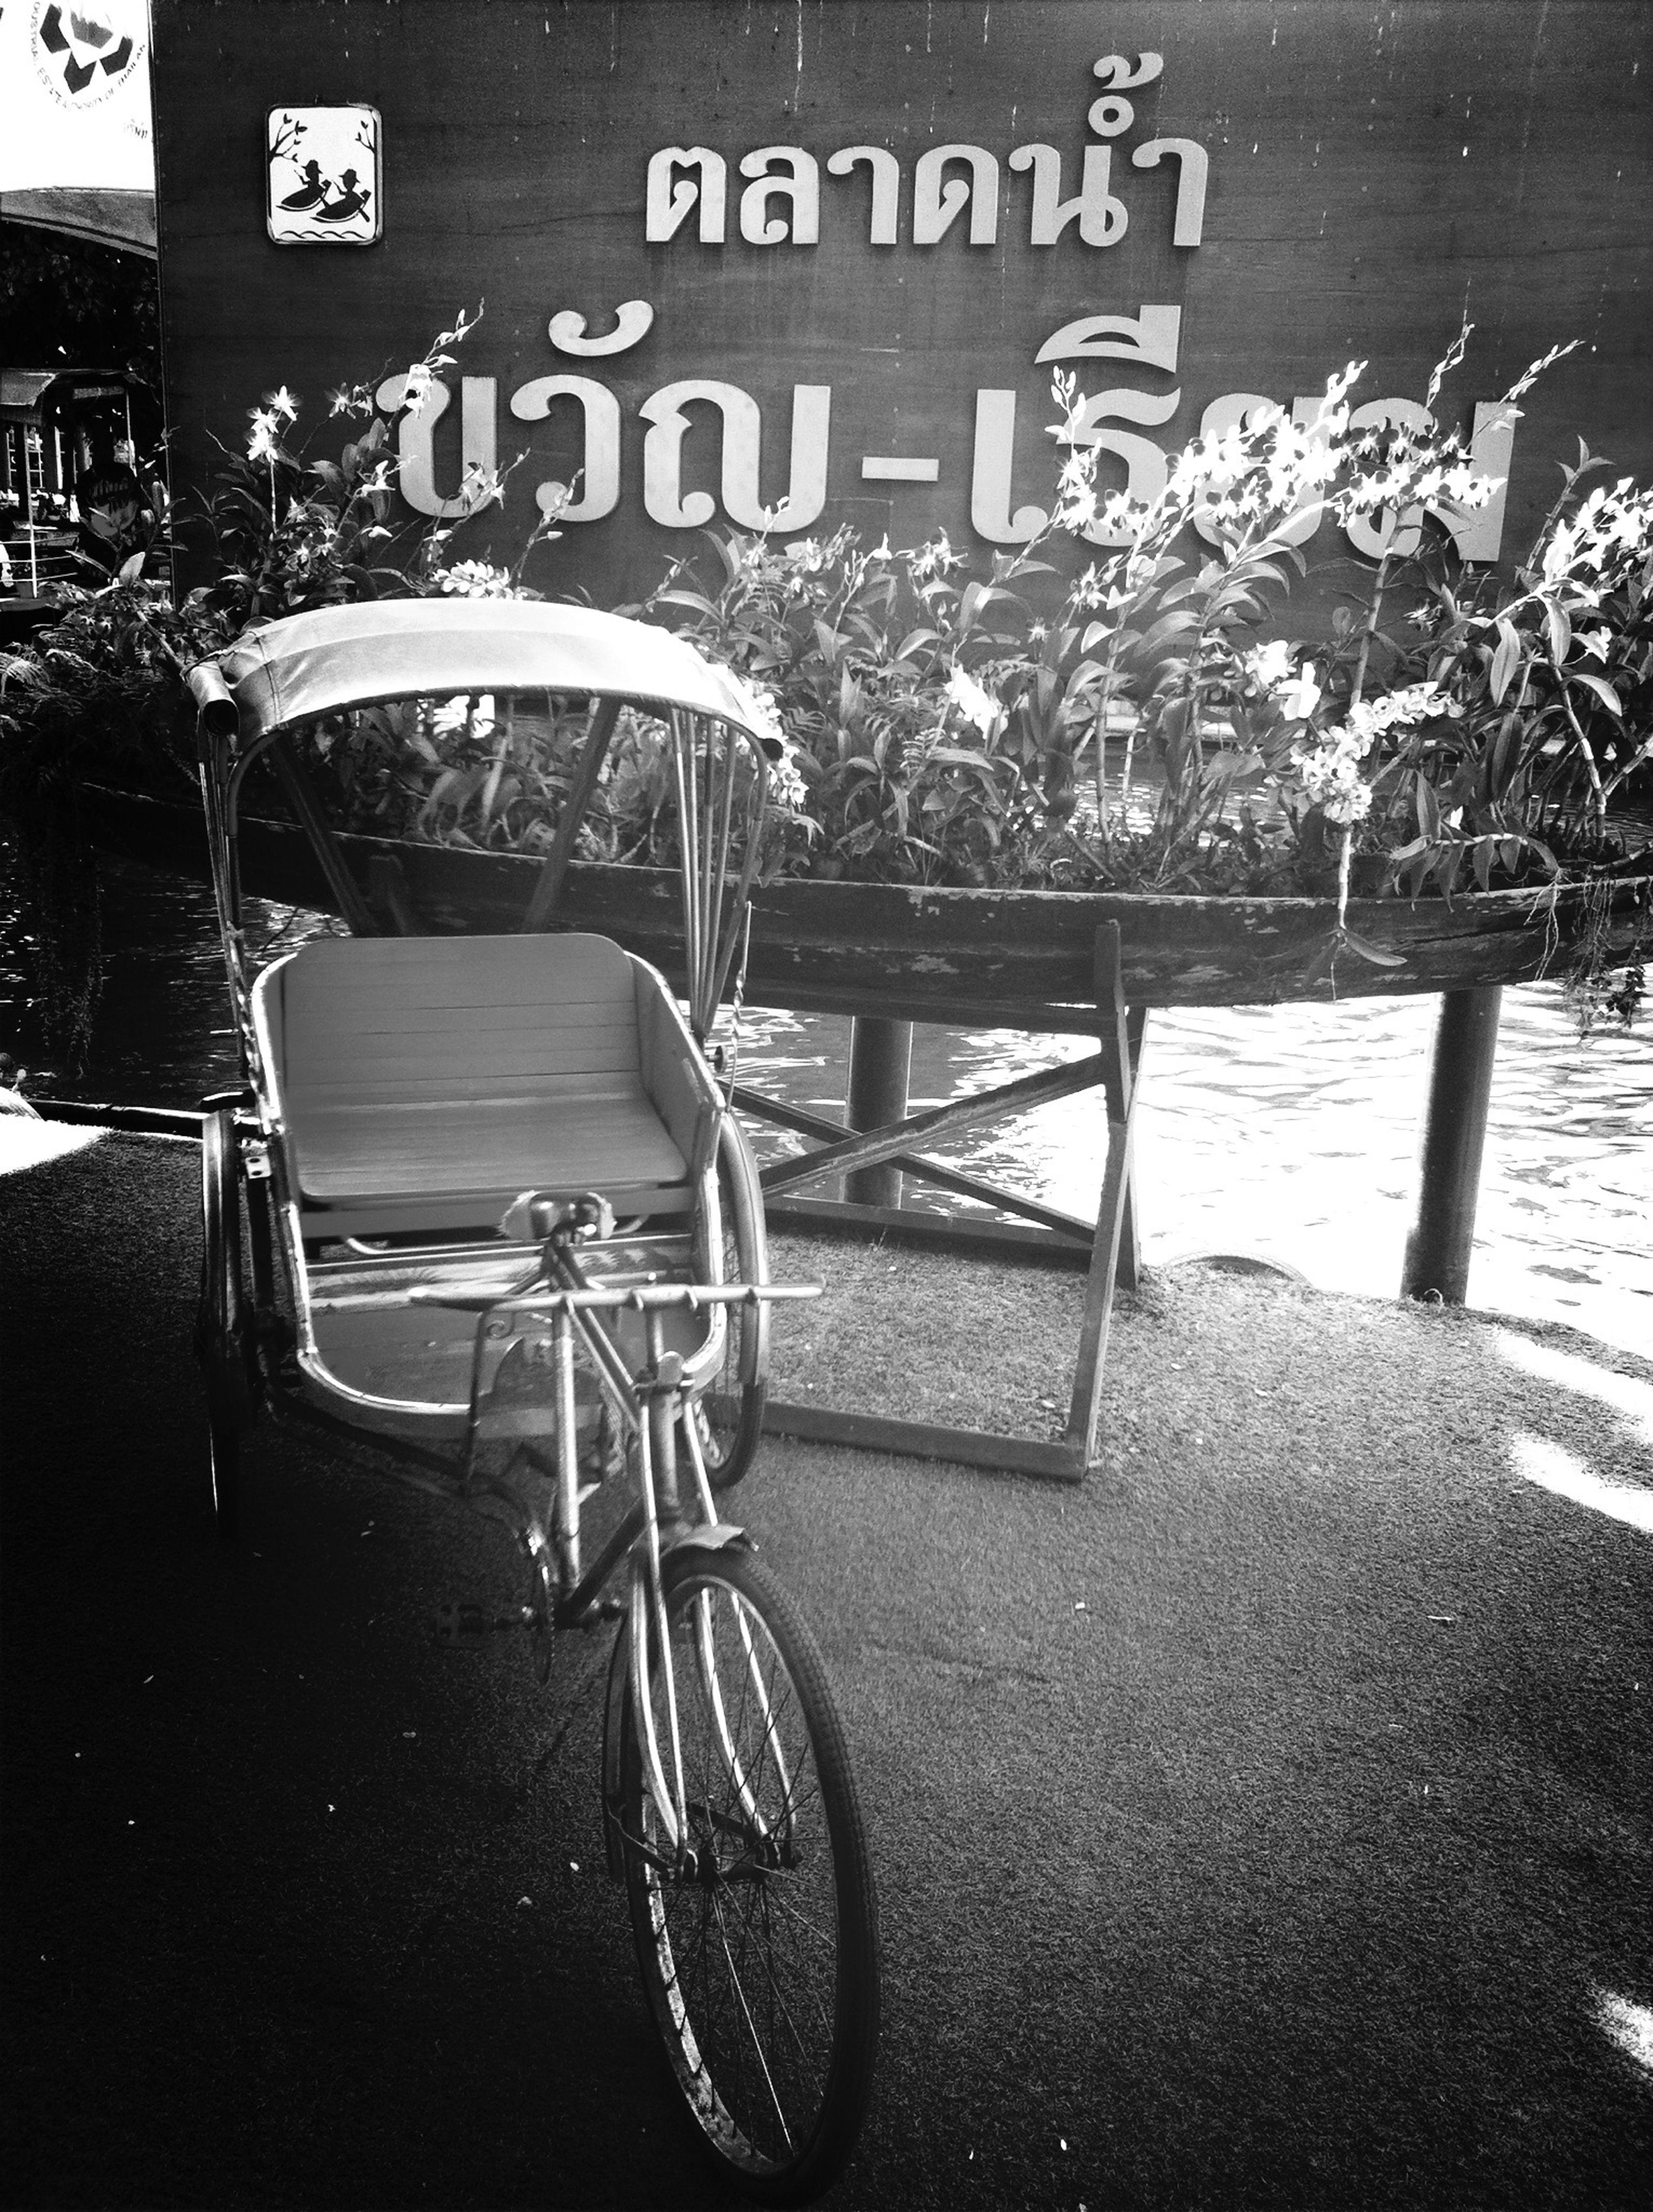 Floting Market Bicycle Vintage Black And White